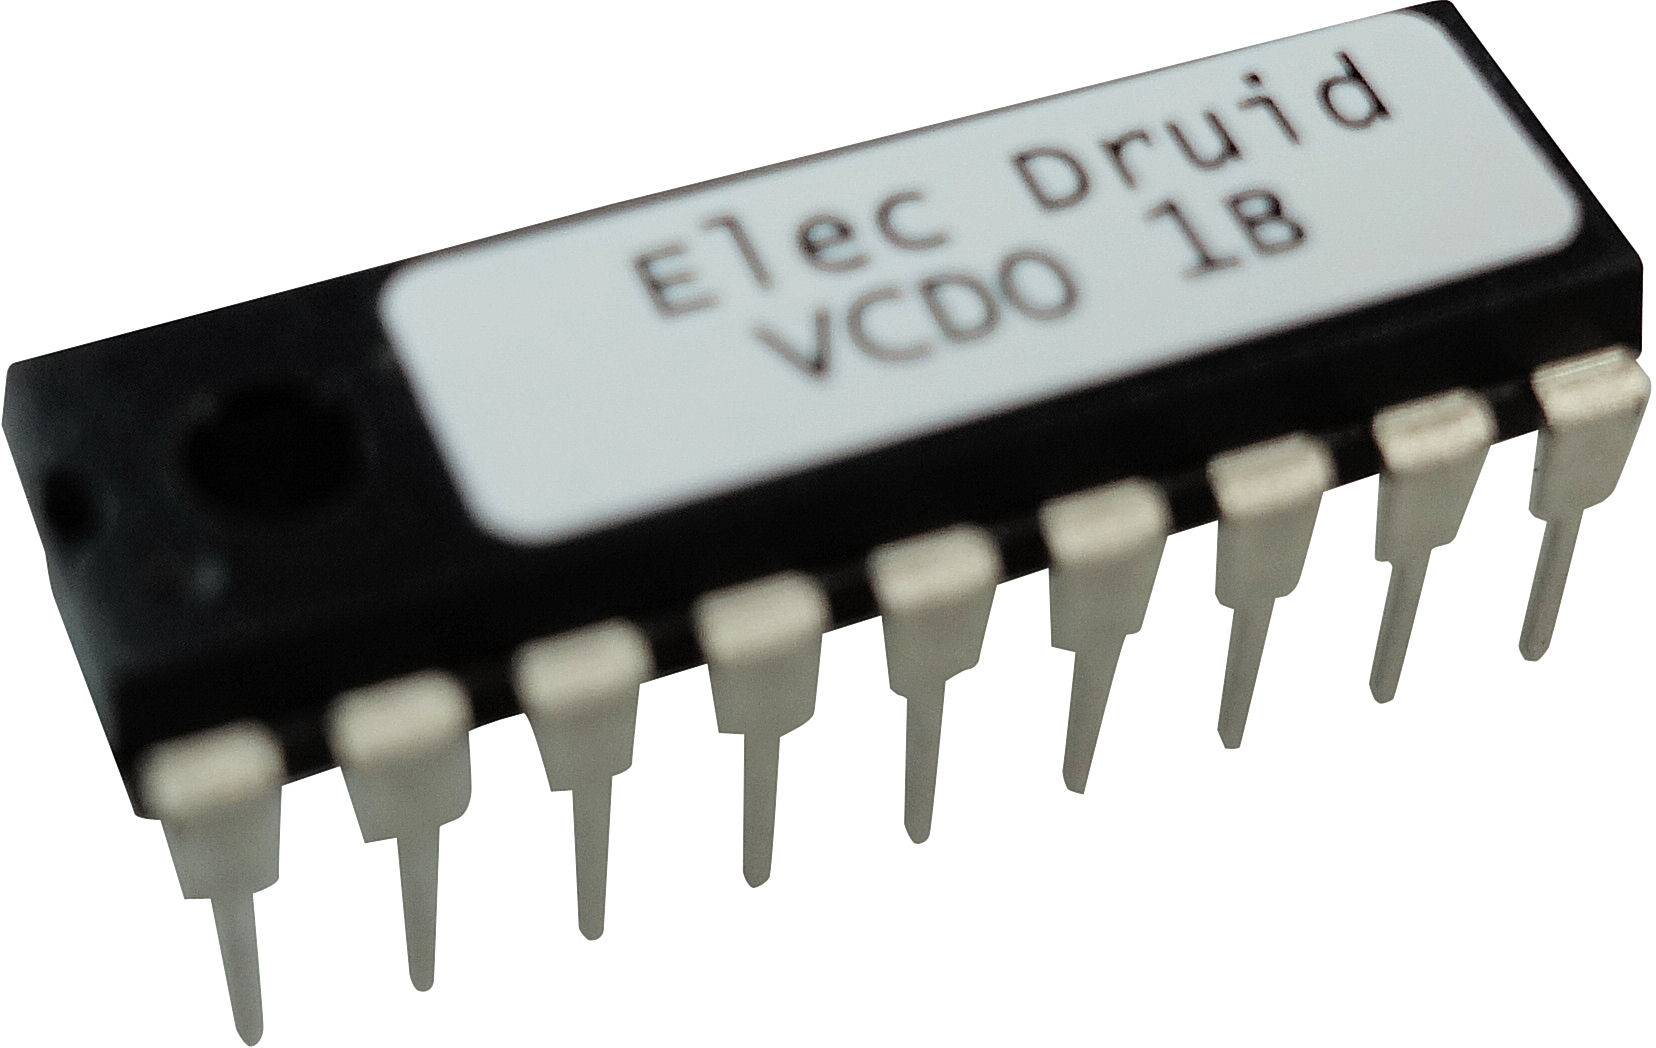 Electric Druid VCDO Wavetable oscillator